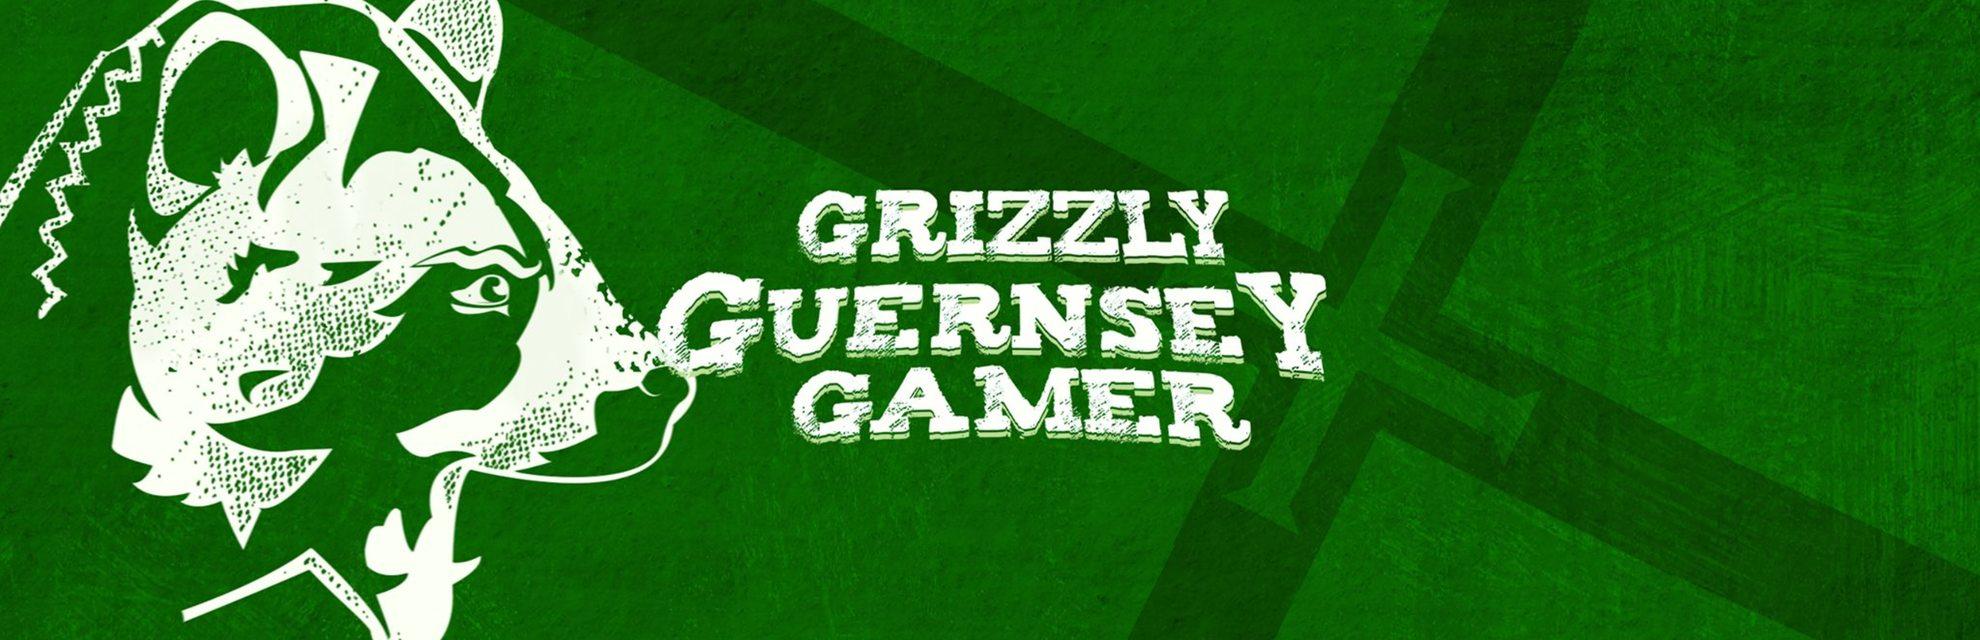 Grizzly Guernsey Gamer blog header photo